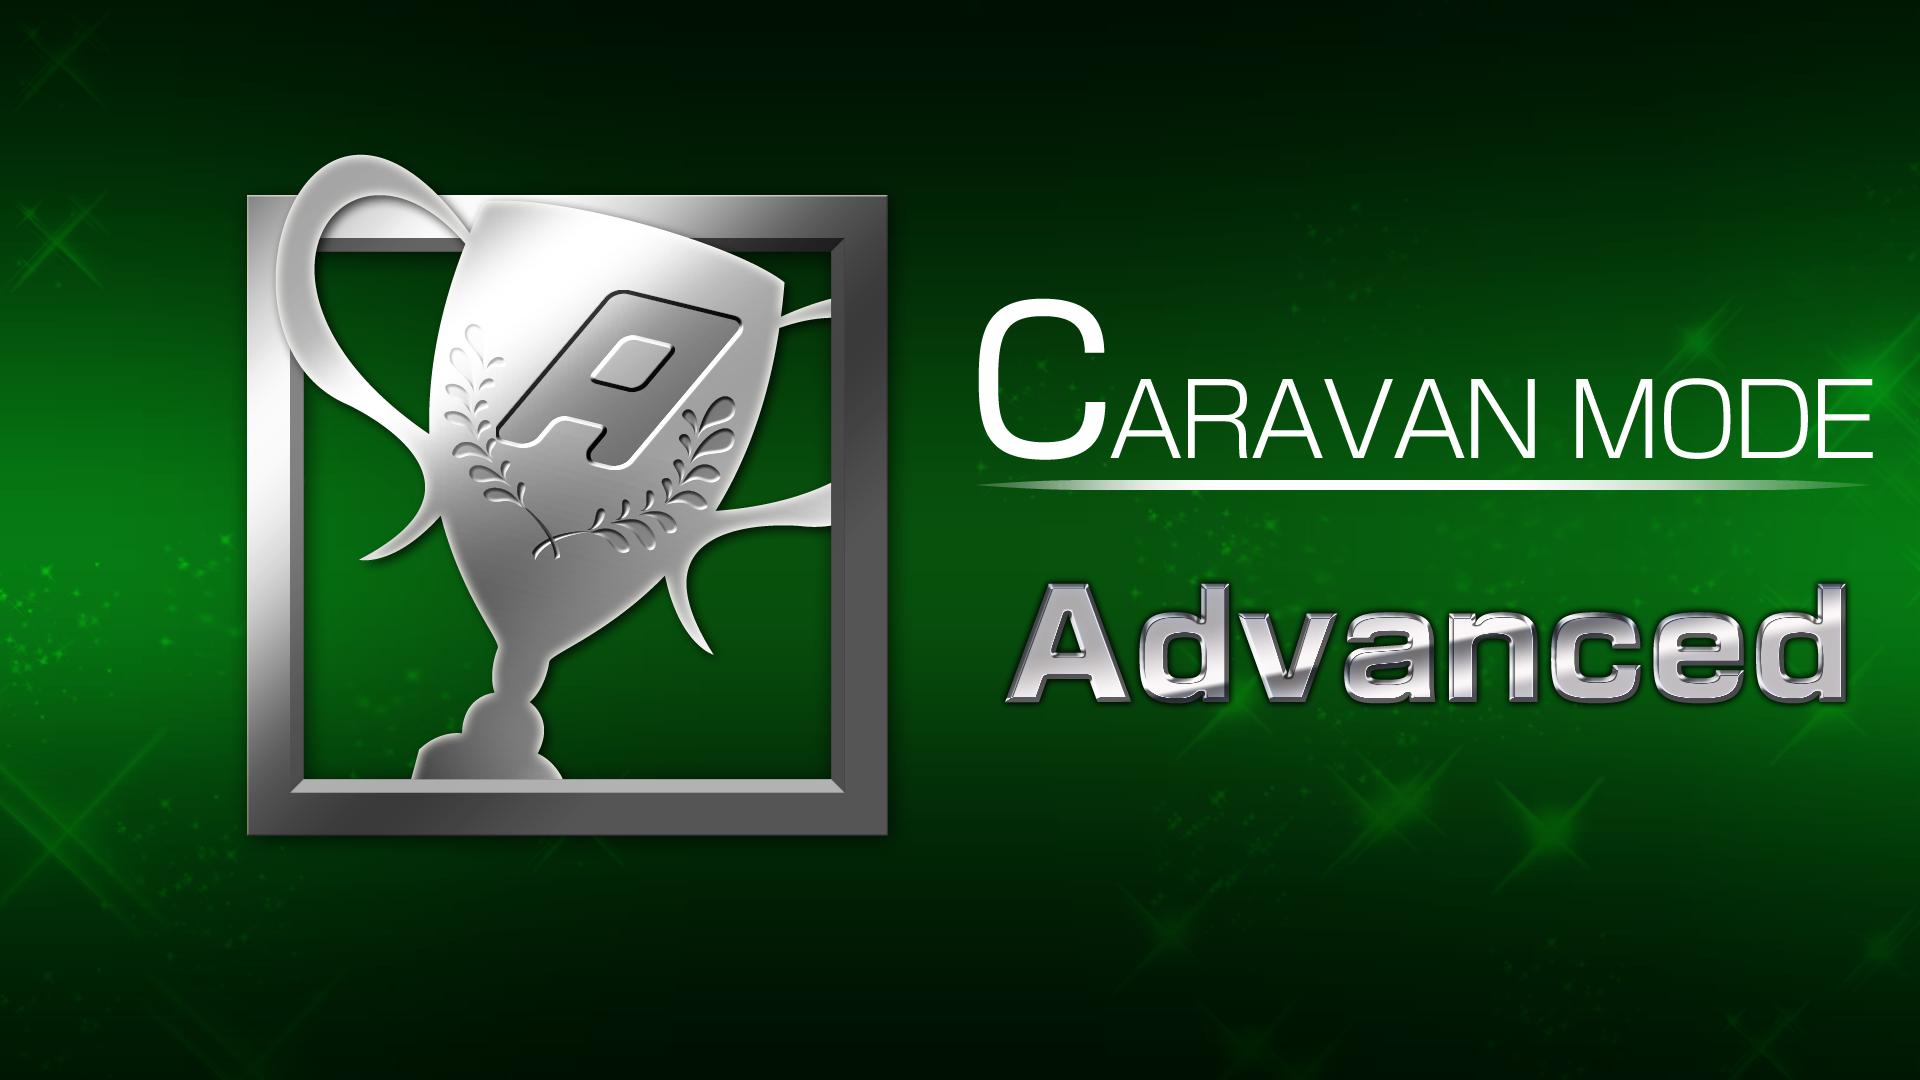 Icon for CARAVAN MODE 2 win(s)